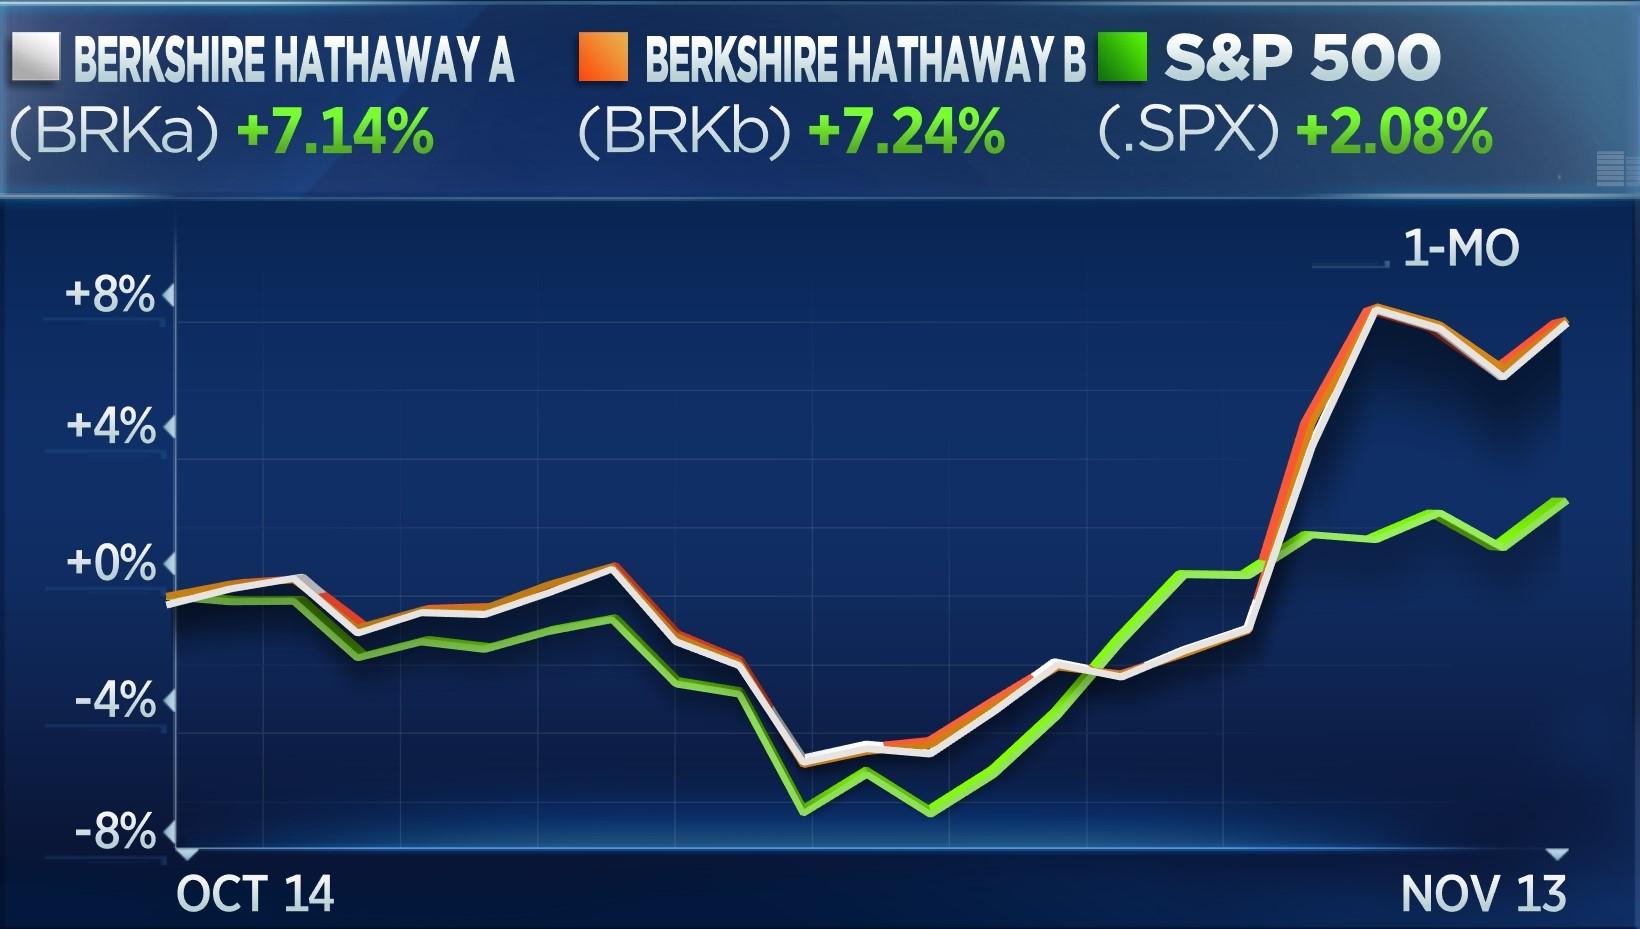 BRKA vs BRKB vs S&P - 1 month